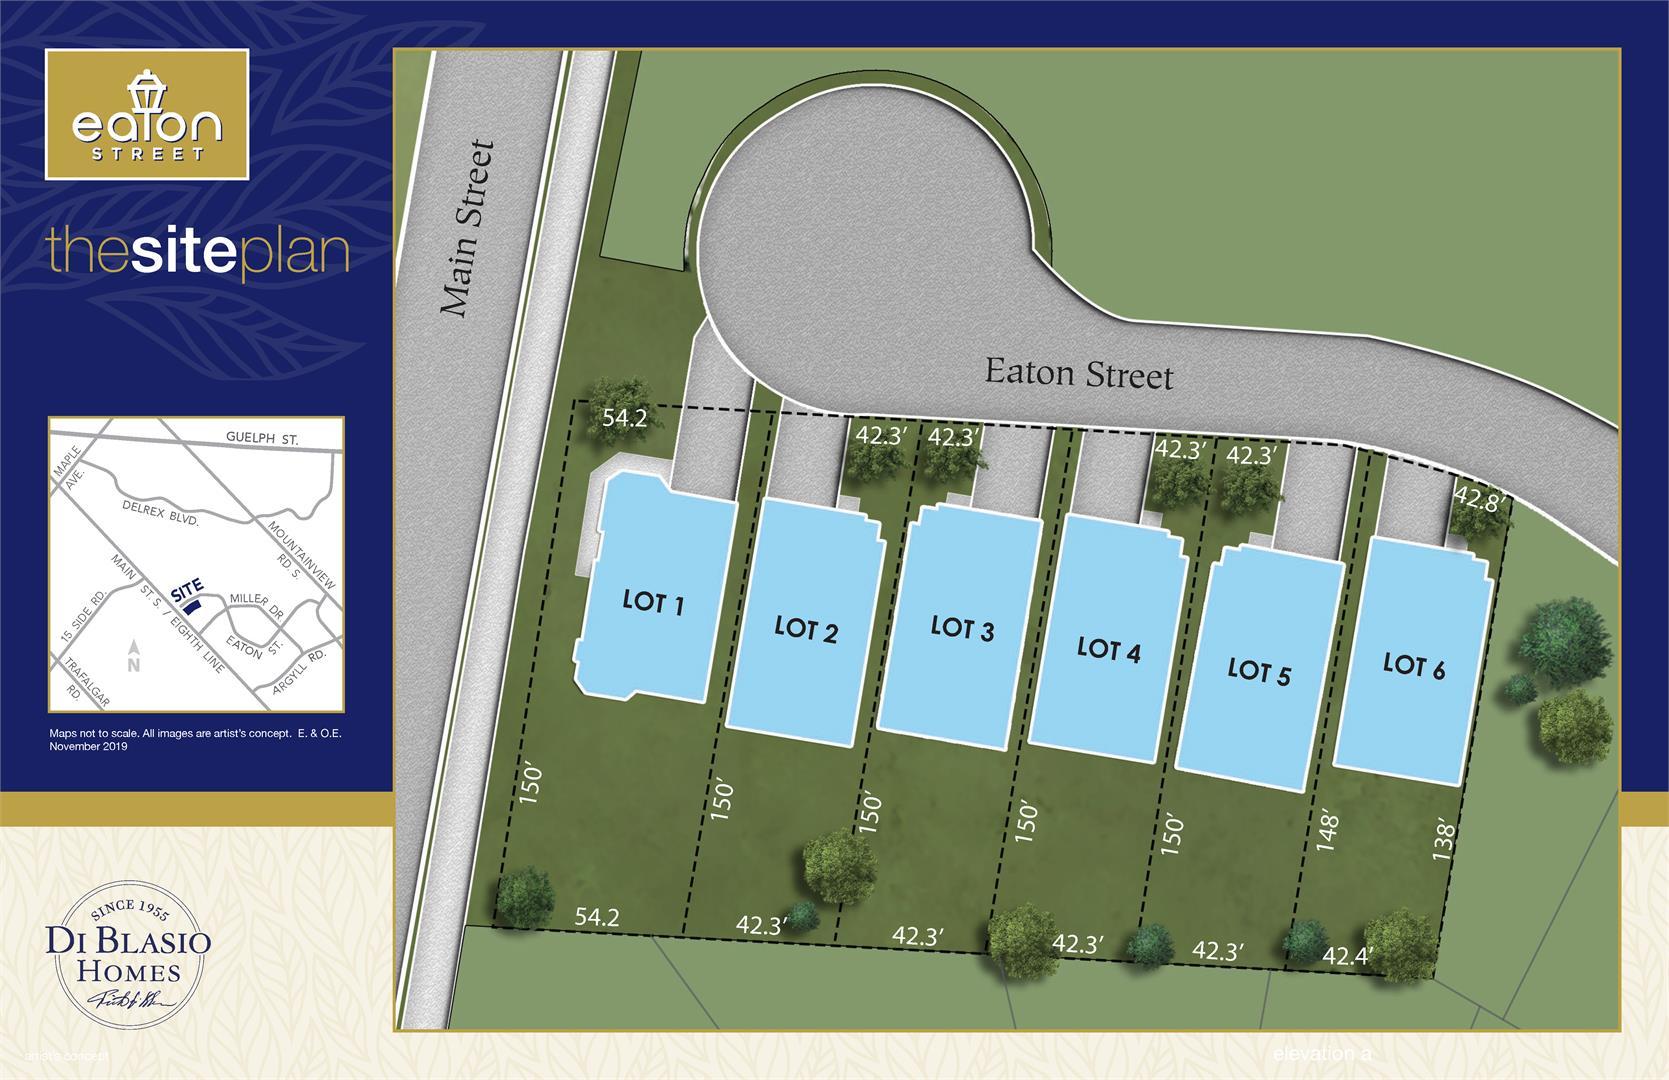 EatonStreet_Siteplan